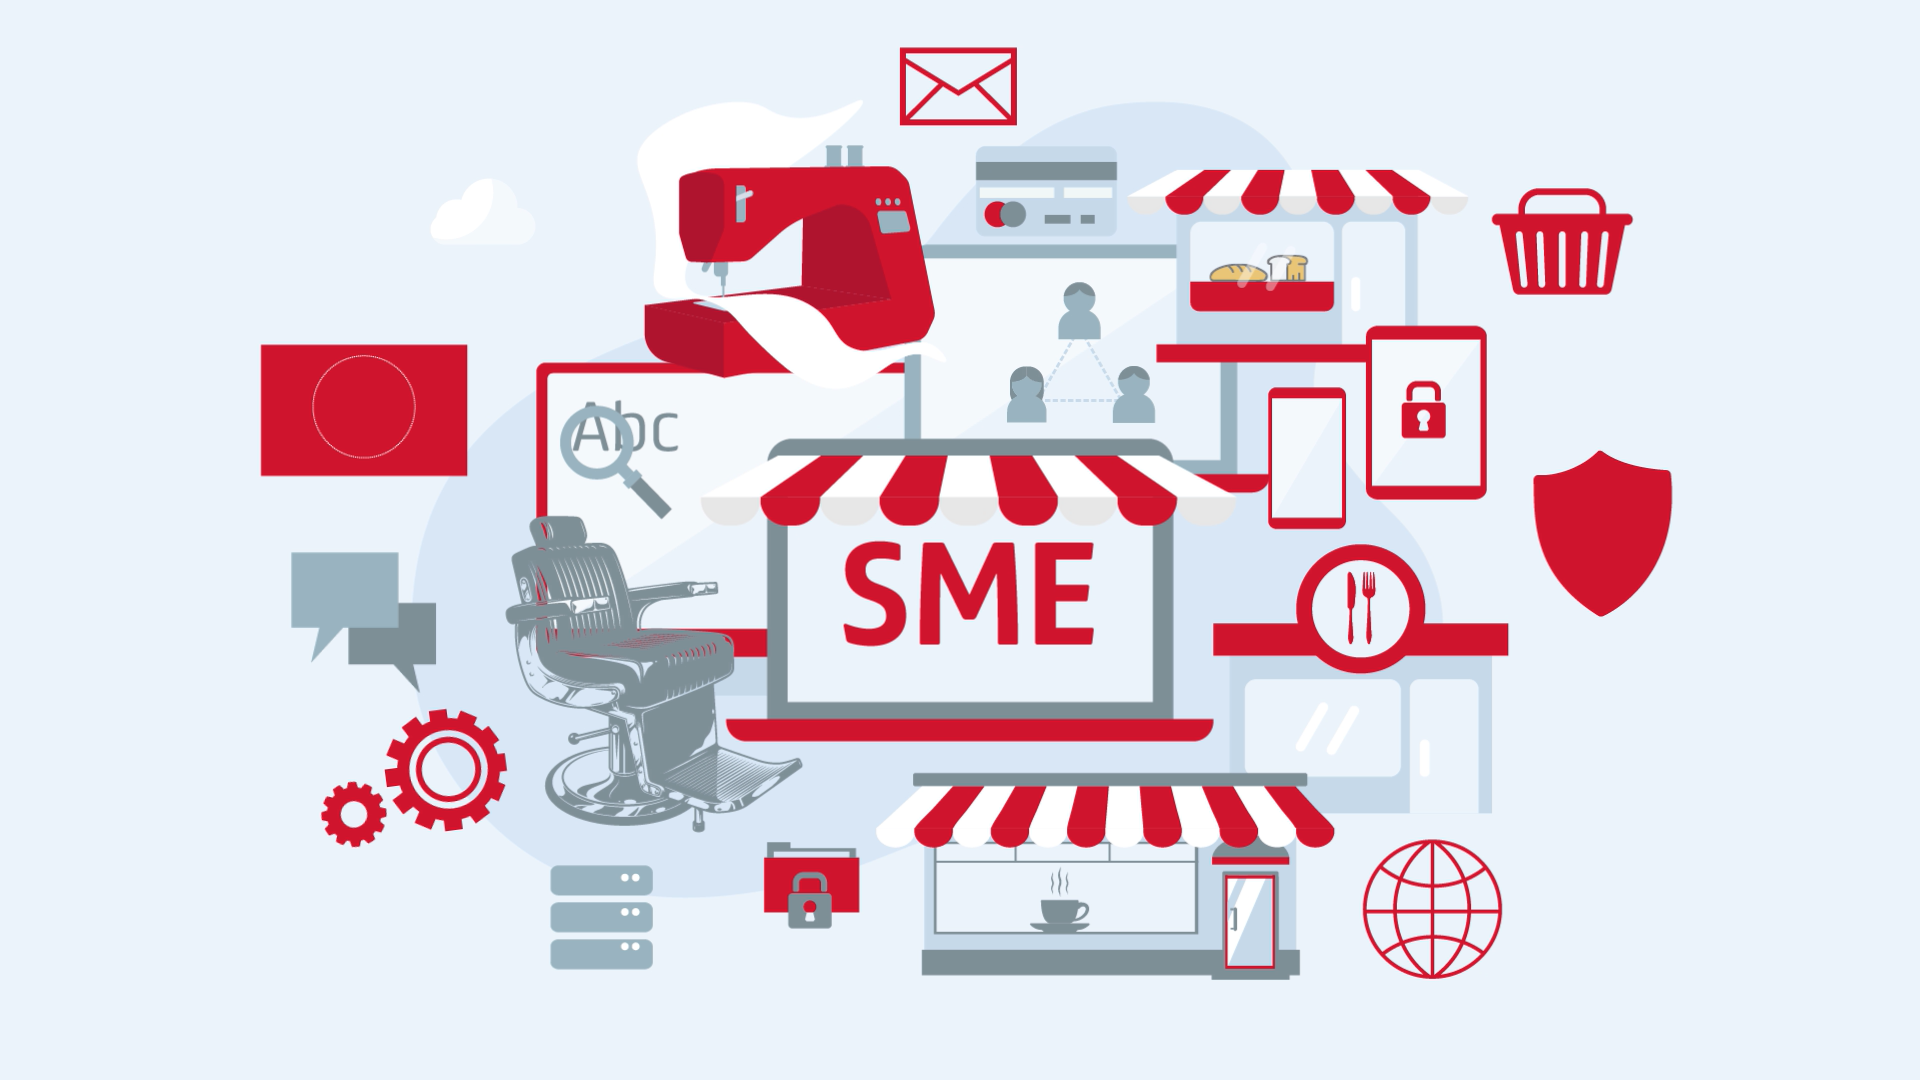 SME generic